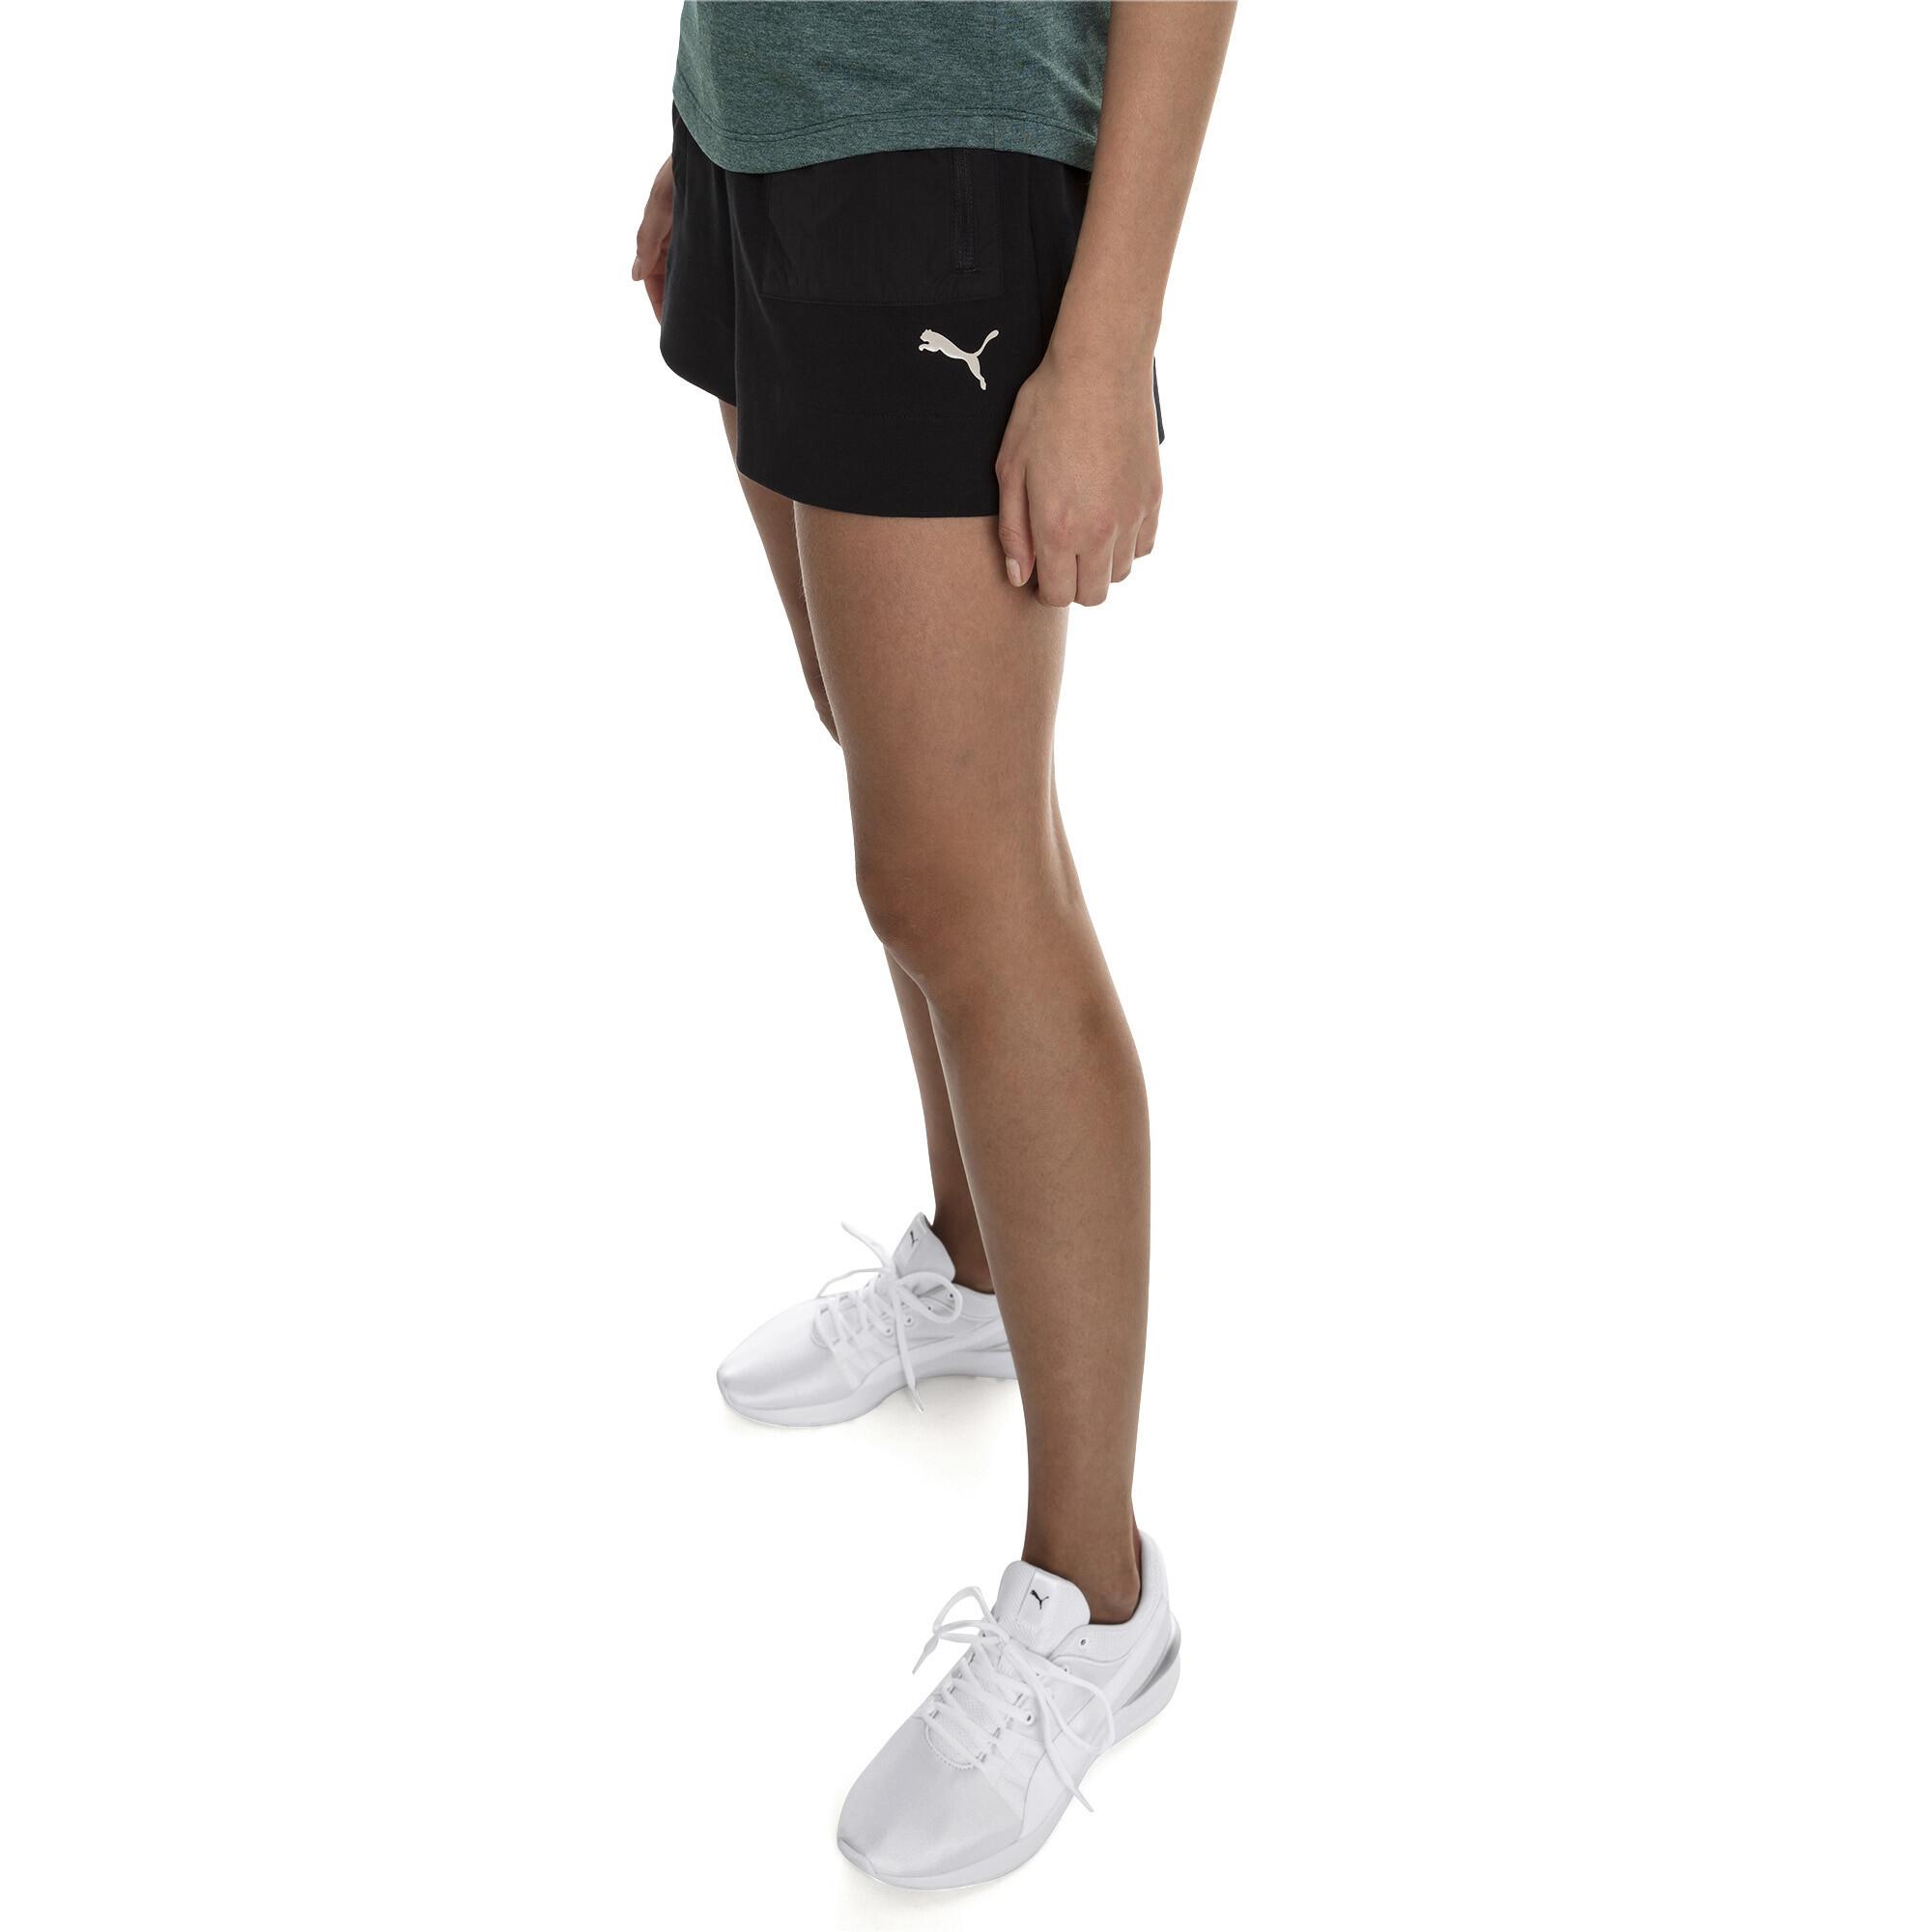 1db714f4212d PUMA Evostripe Lite Women's Shorts Girls Knitted Shorts Basics | eBay